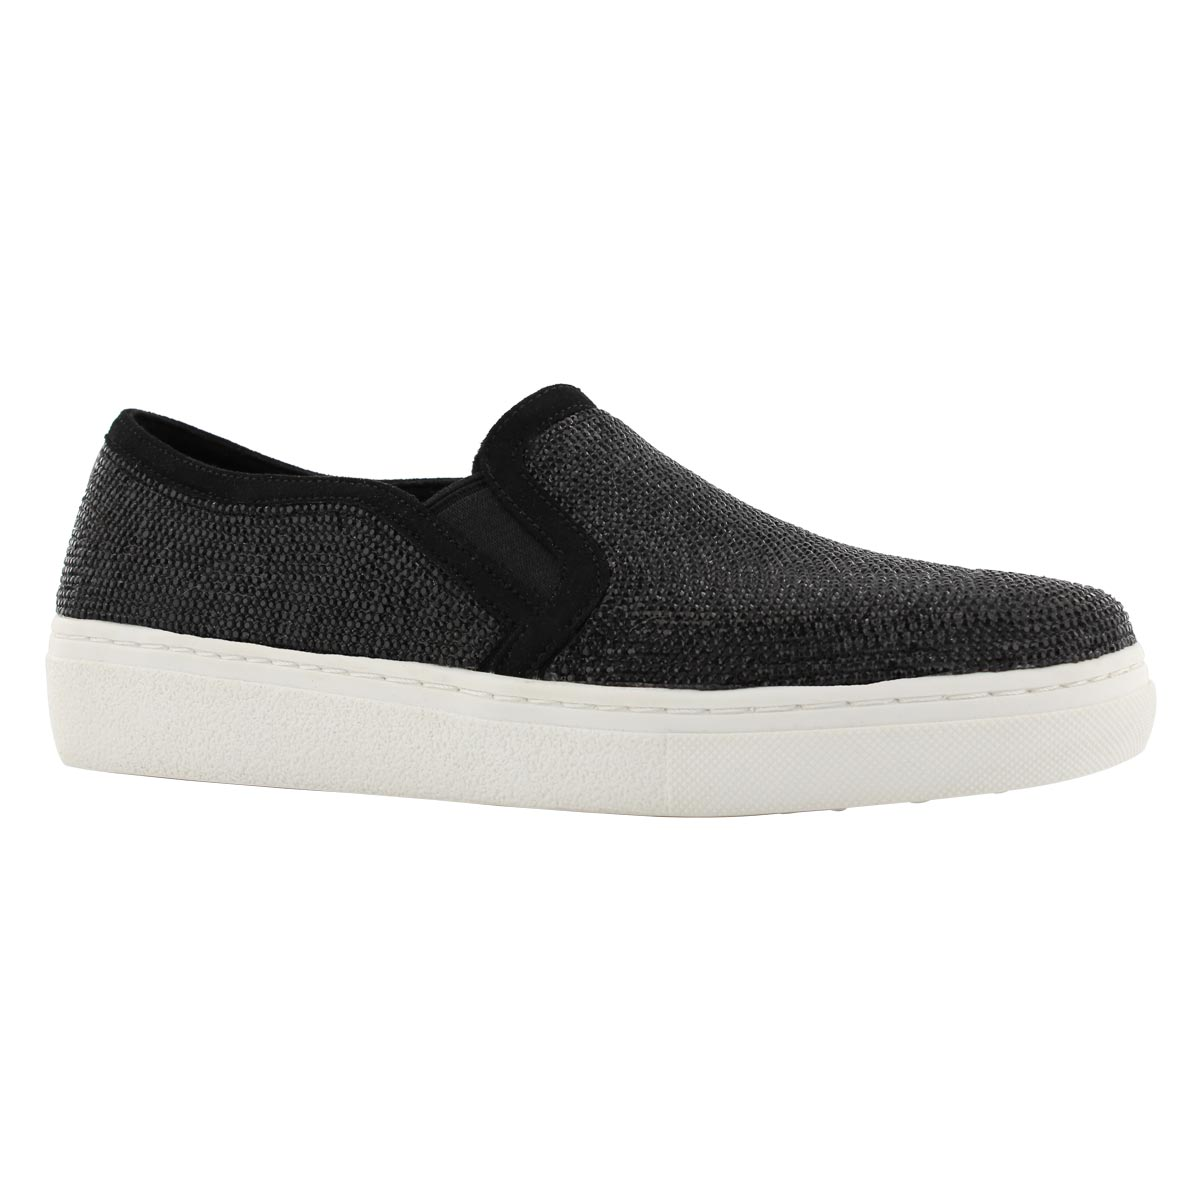 Lds Goldie black slip on shoe